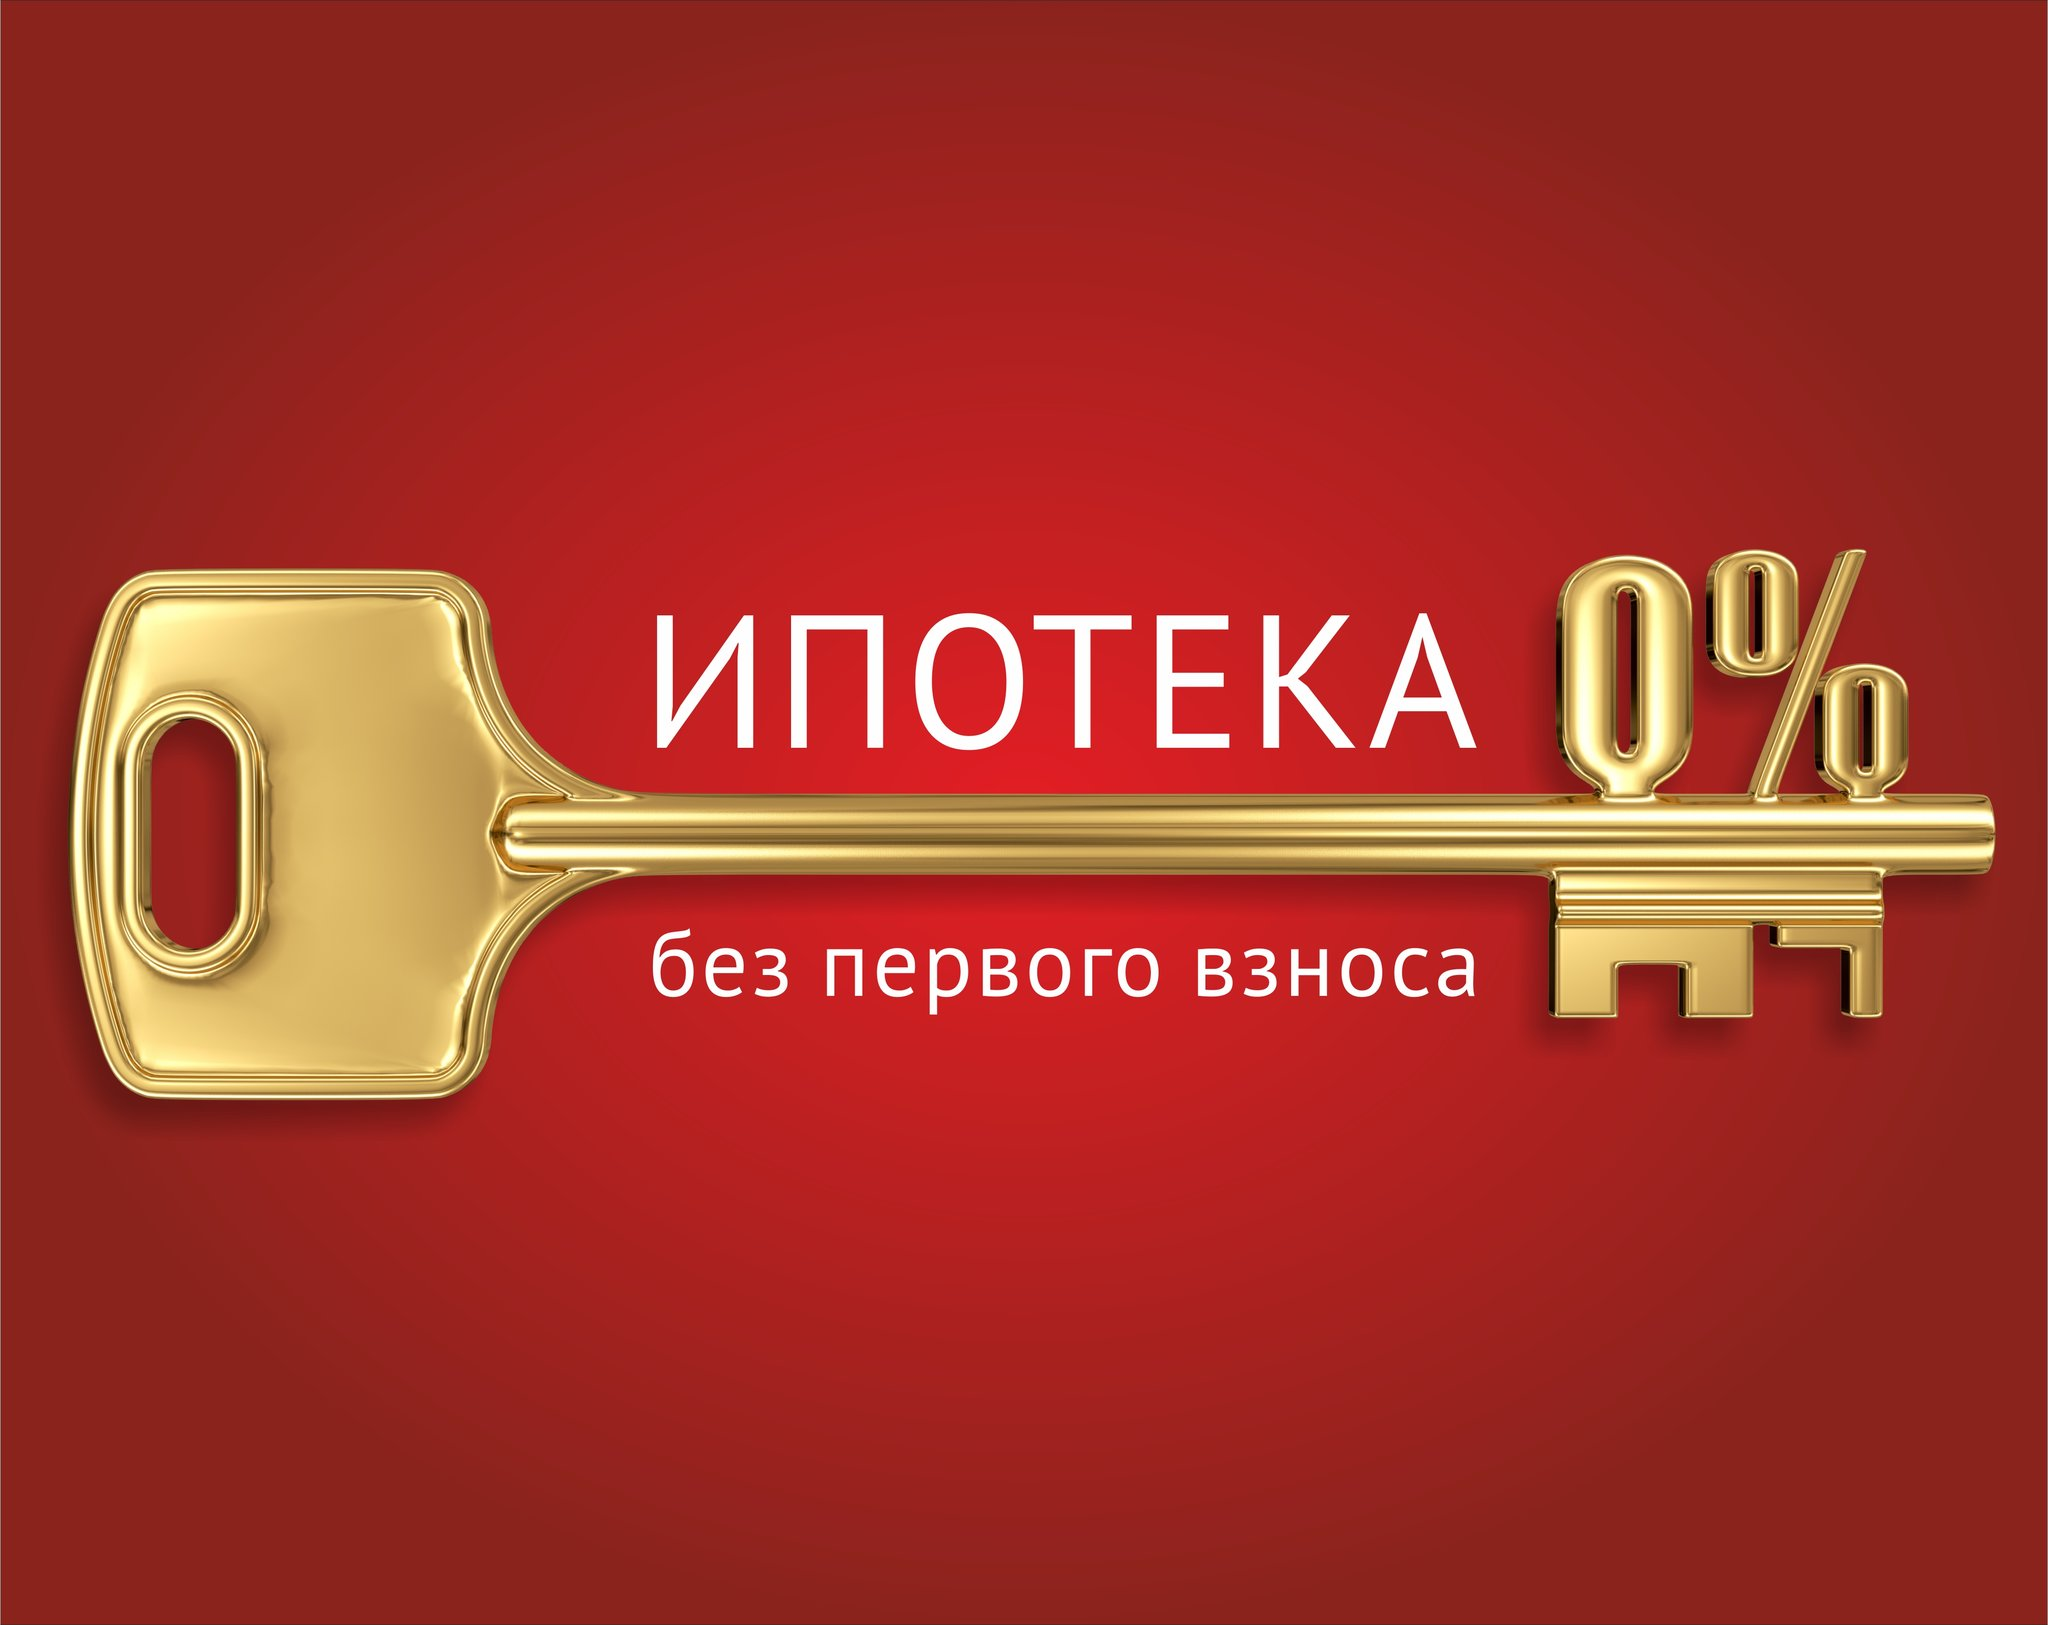 ипотека без первоначального взноса 2017 краснодар каким-то